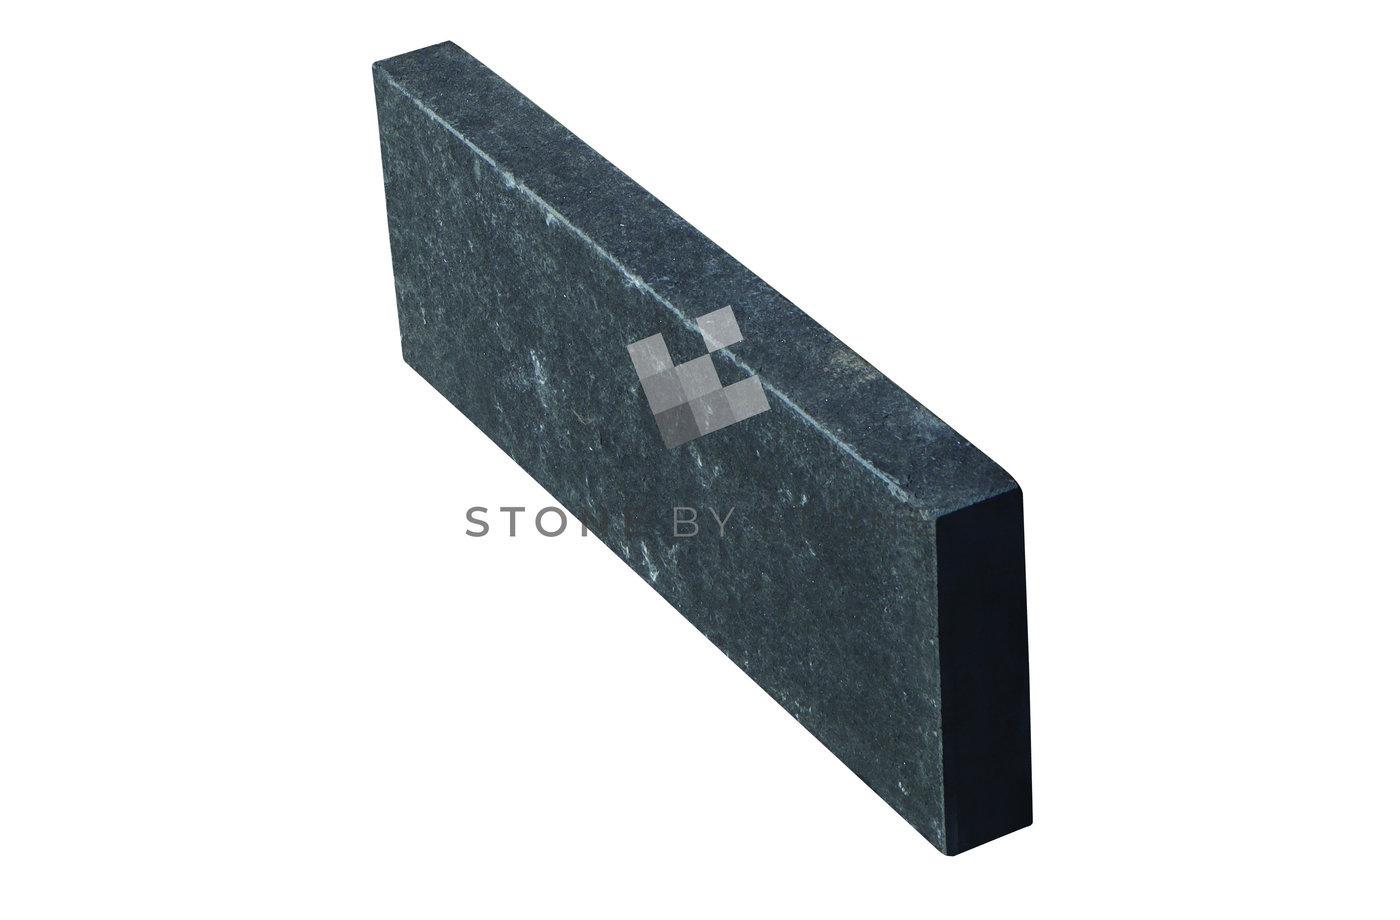 Bordure 20x60/6cm - Basalte noir - Flammé brossé